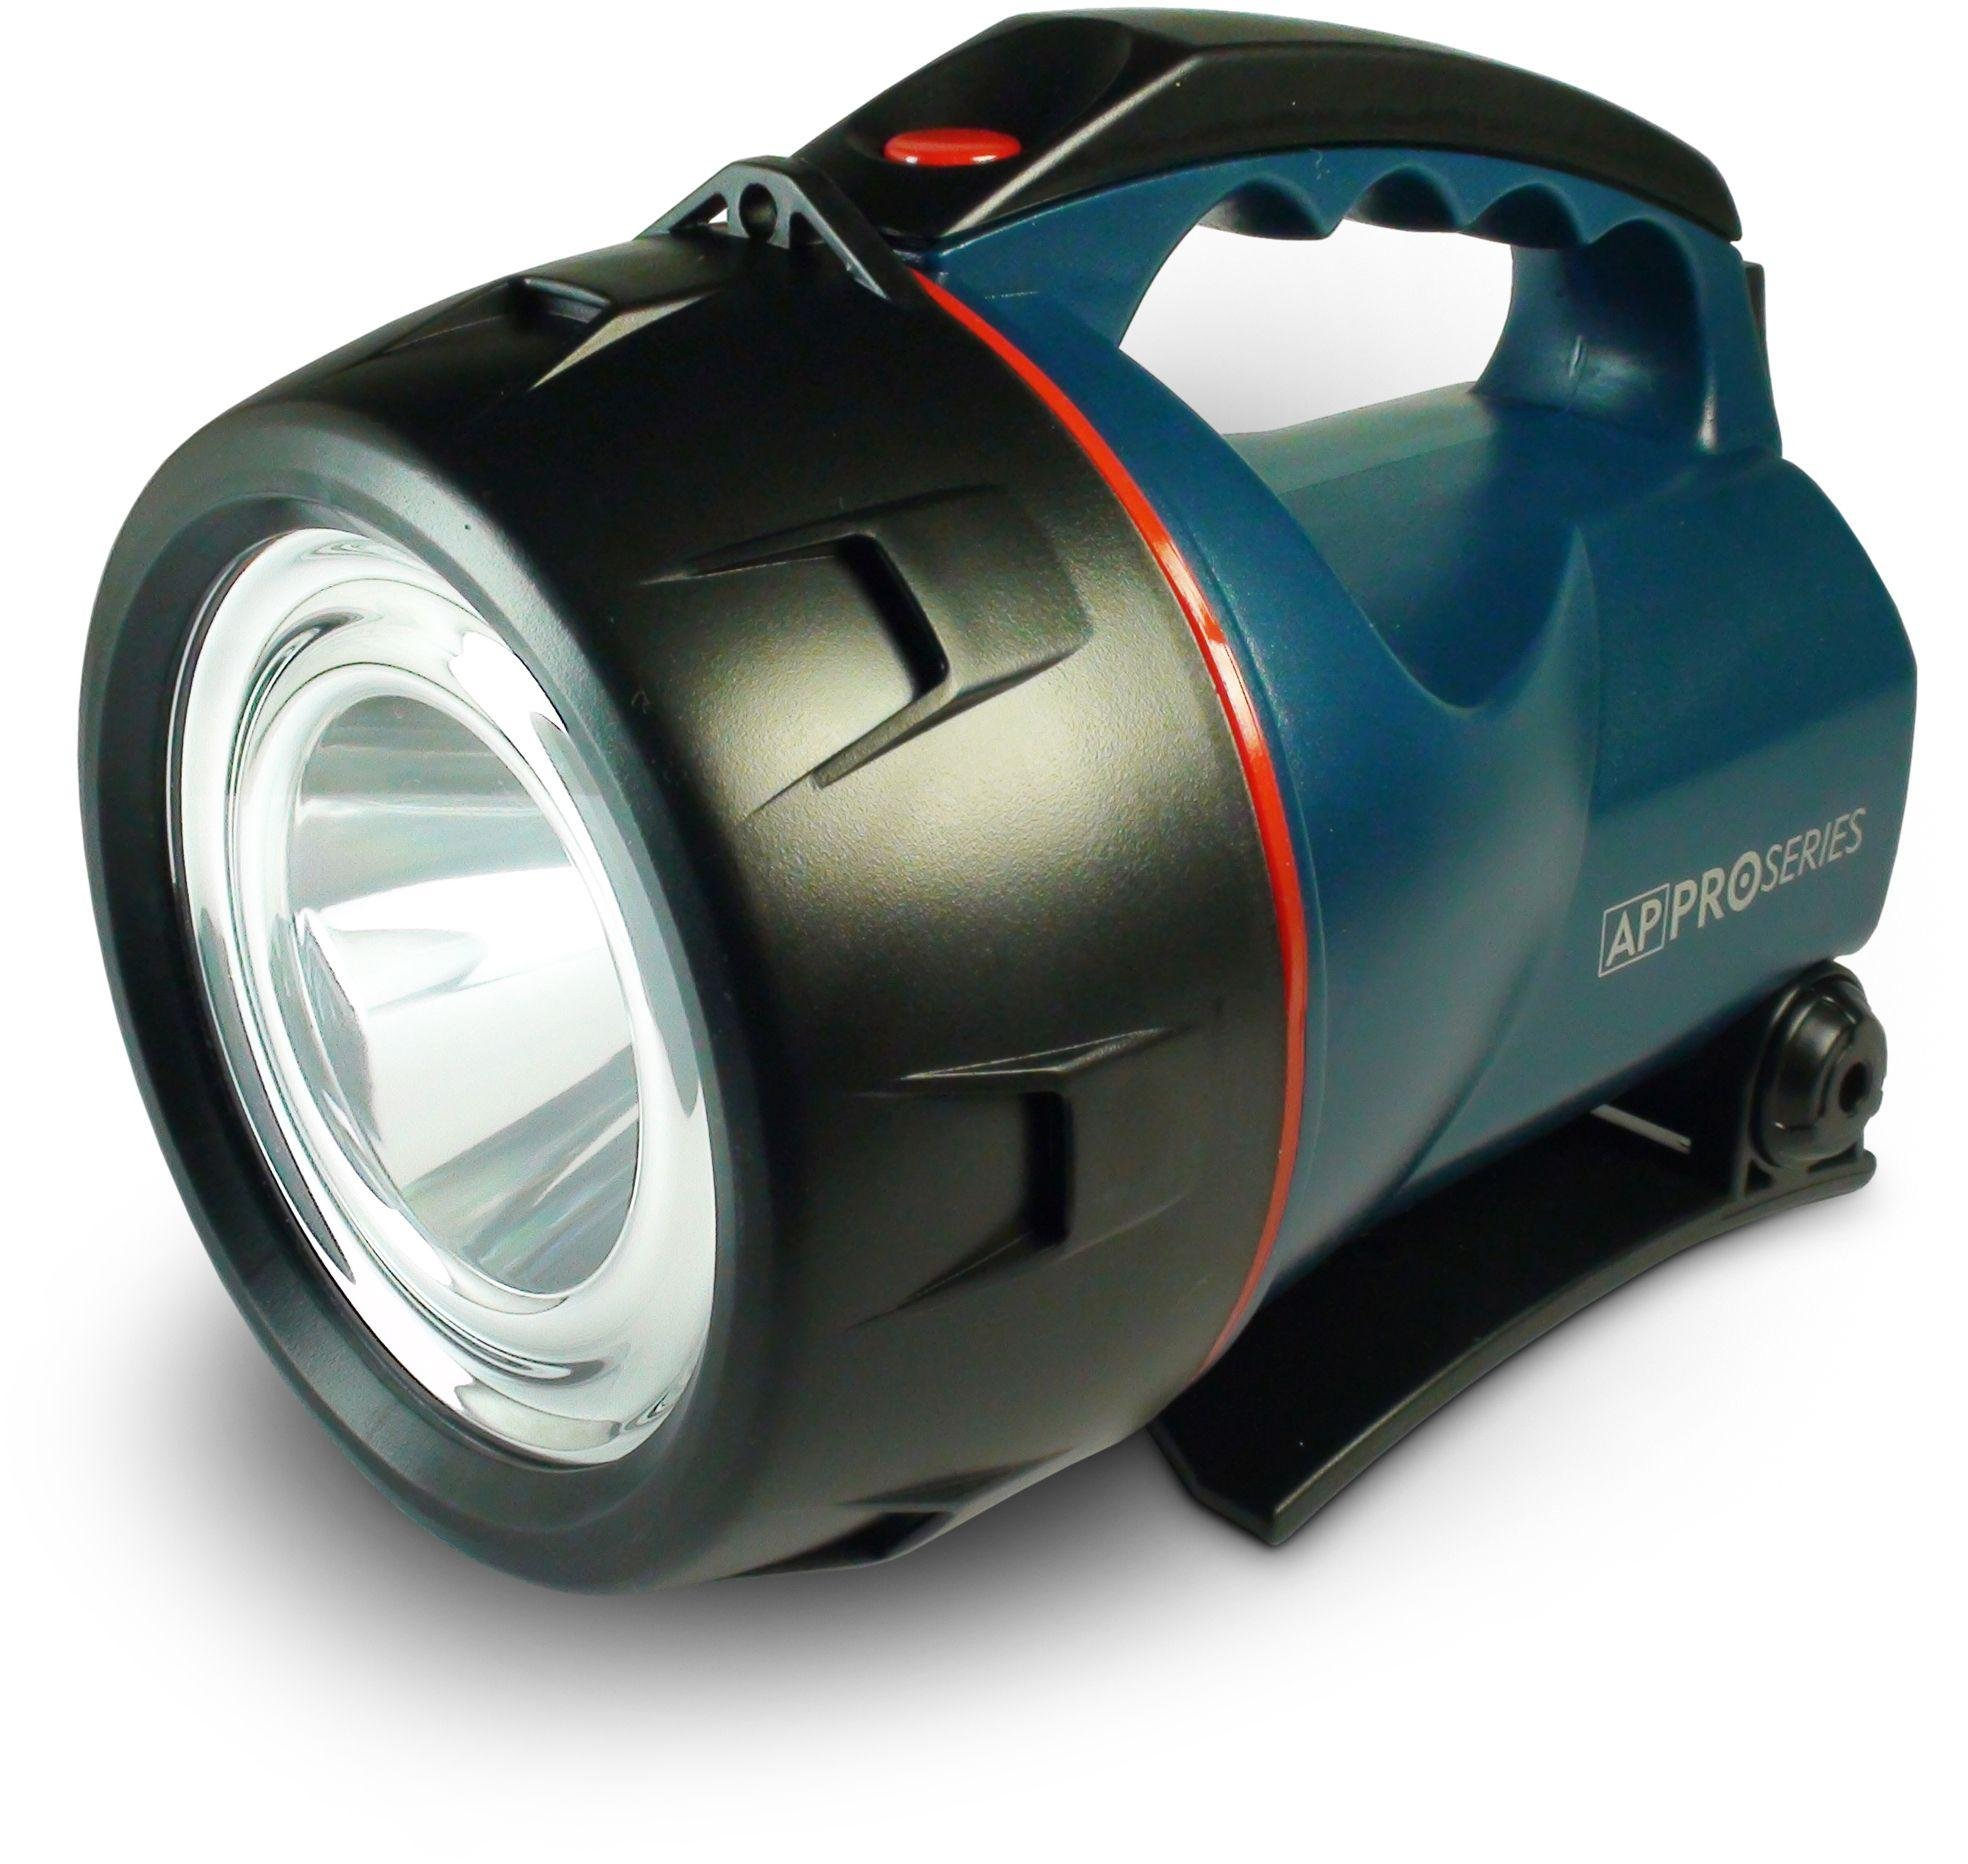 Image of AP Pro Series - 220 Lumen Spotlight CREE Torch